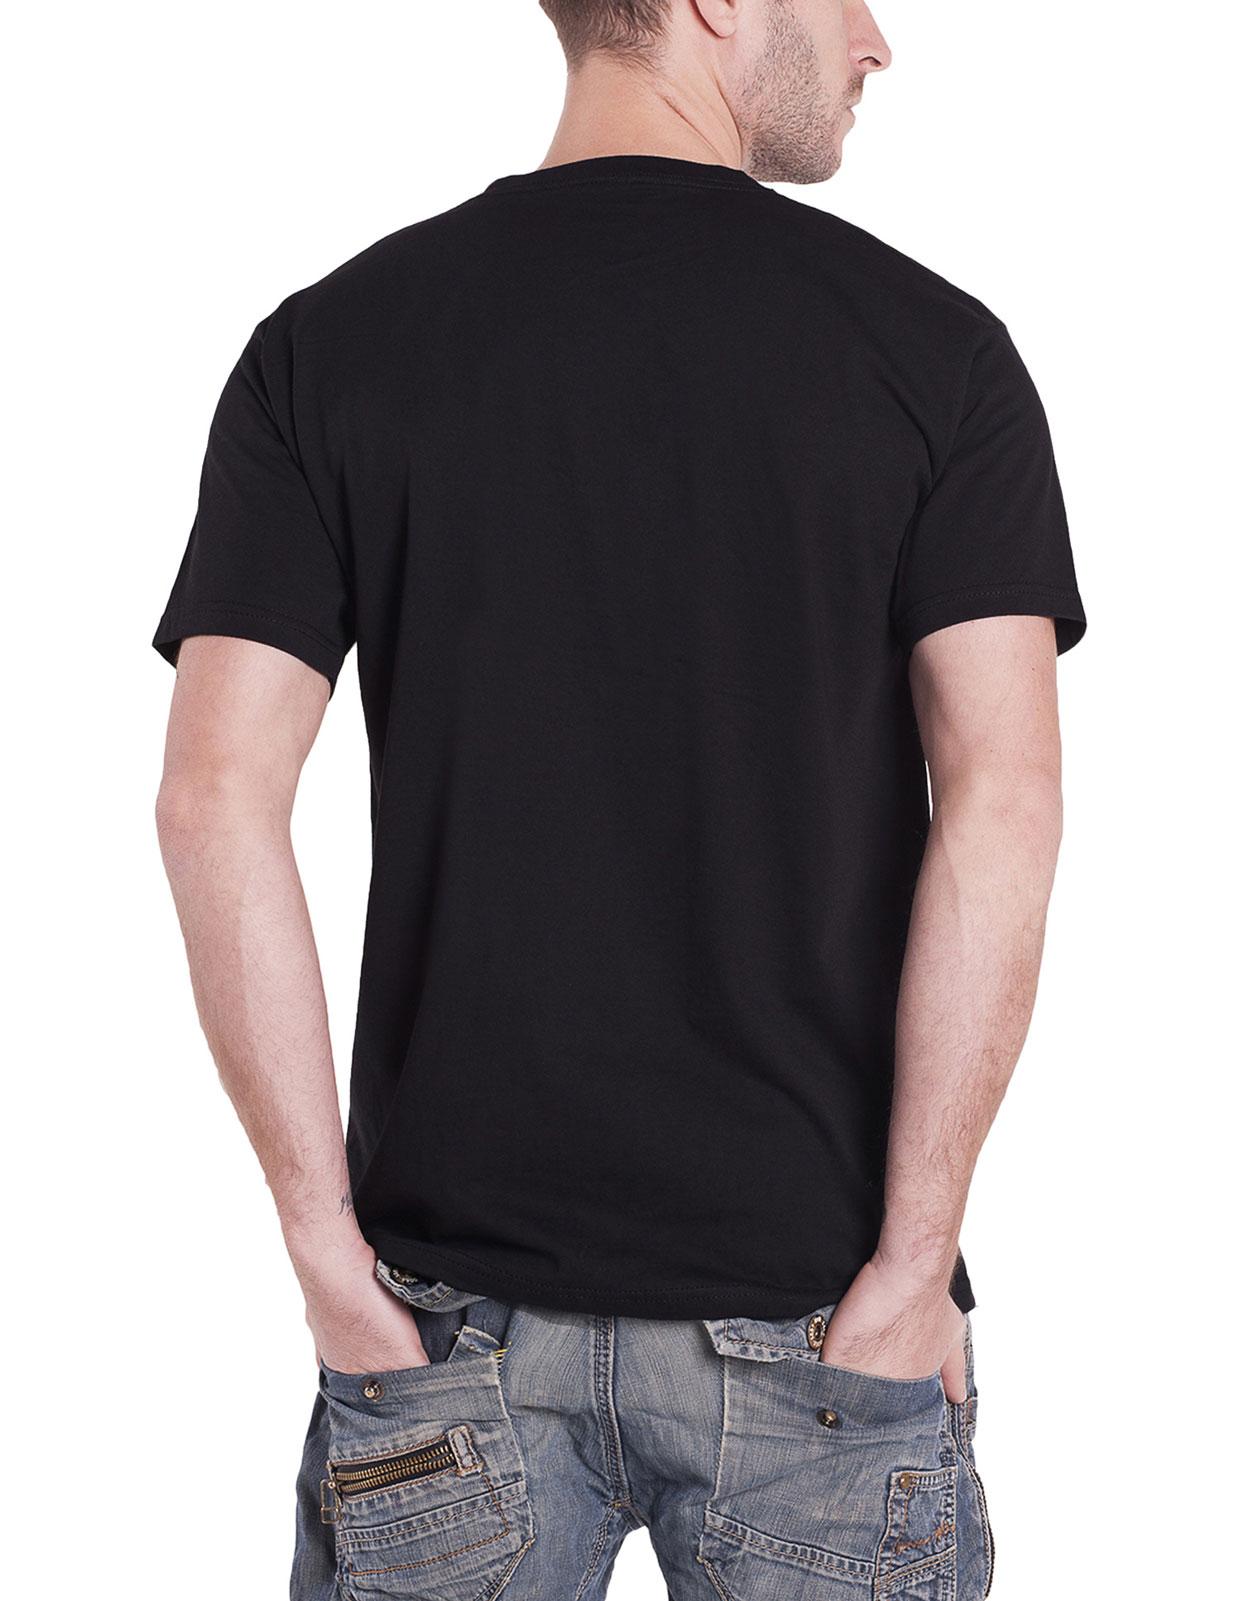 Camiseta-Last-Jedi-De-Star-Wars-Movie-Poster-porgs-Guardia-pretoriana-oficial-para-hombre miniatura 33